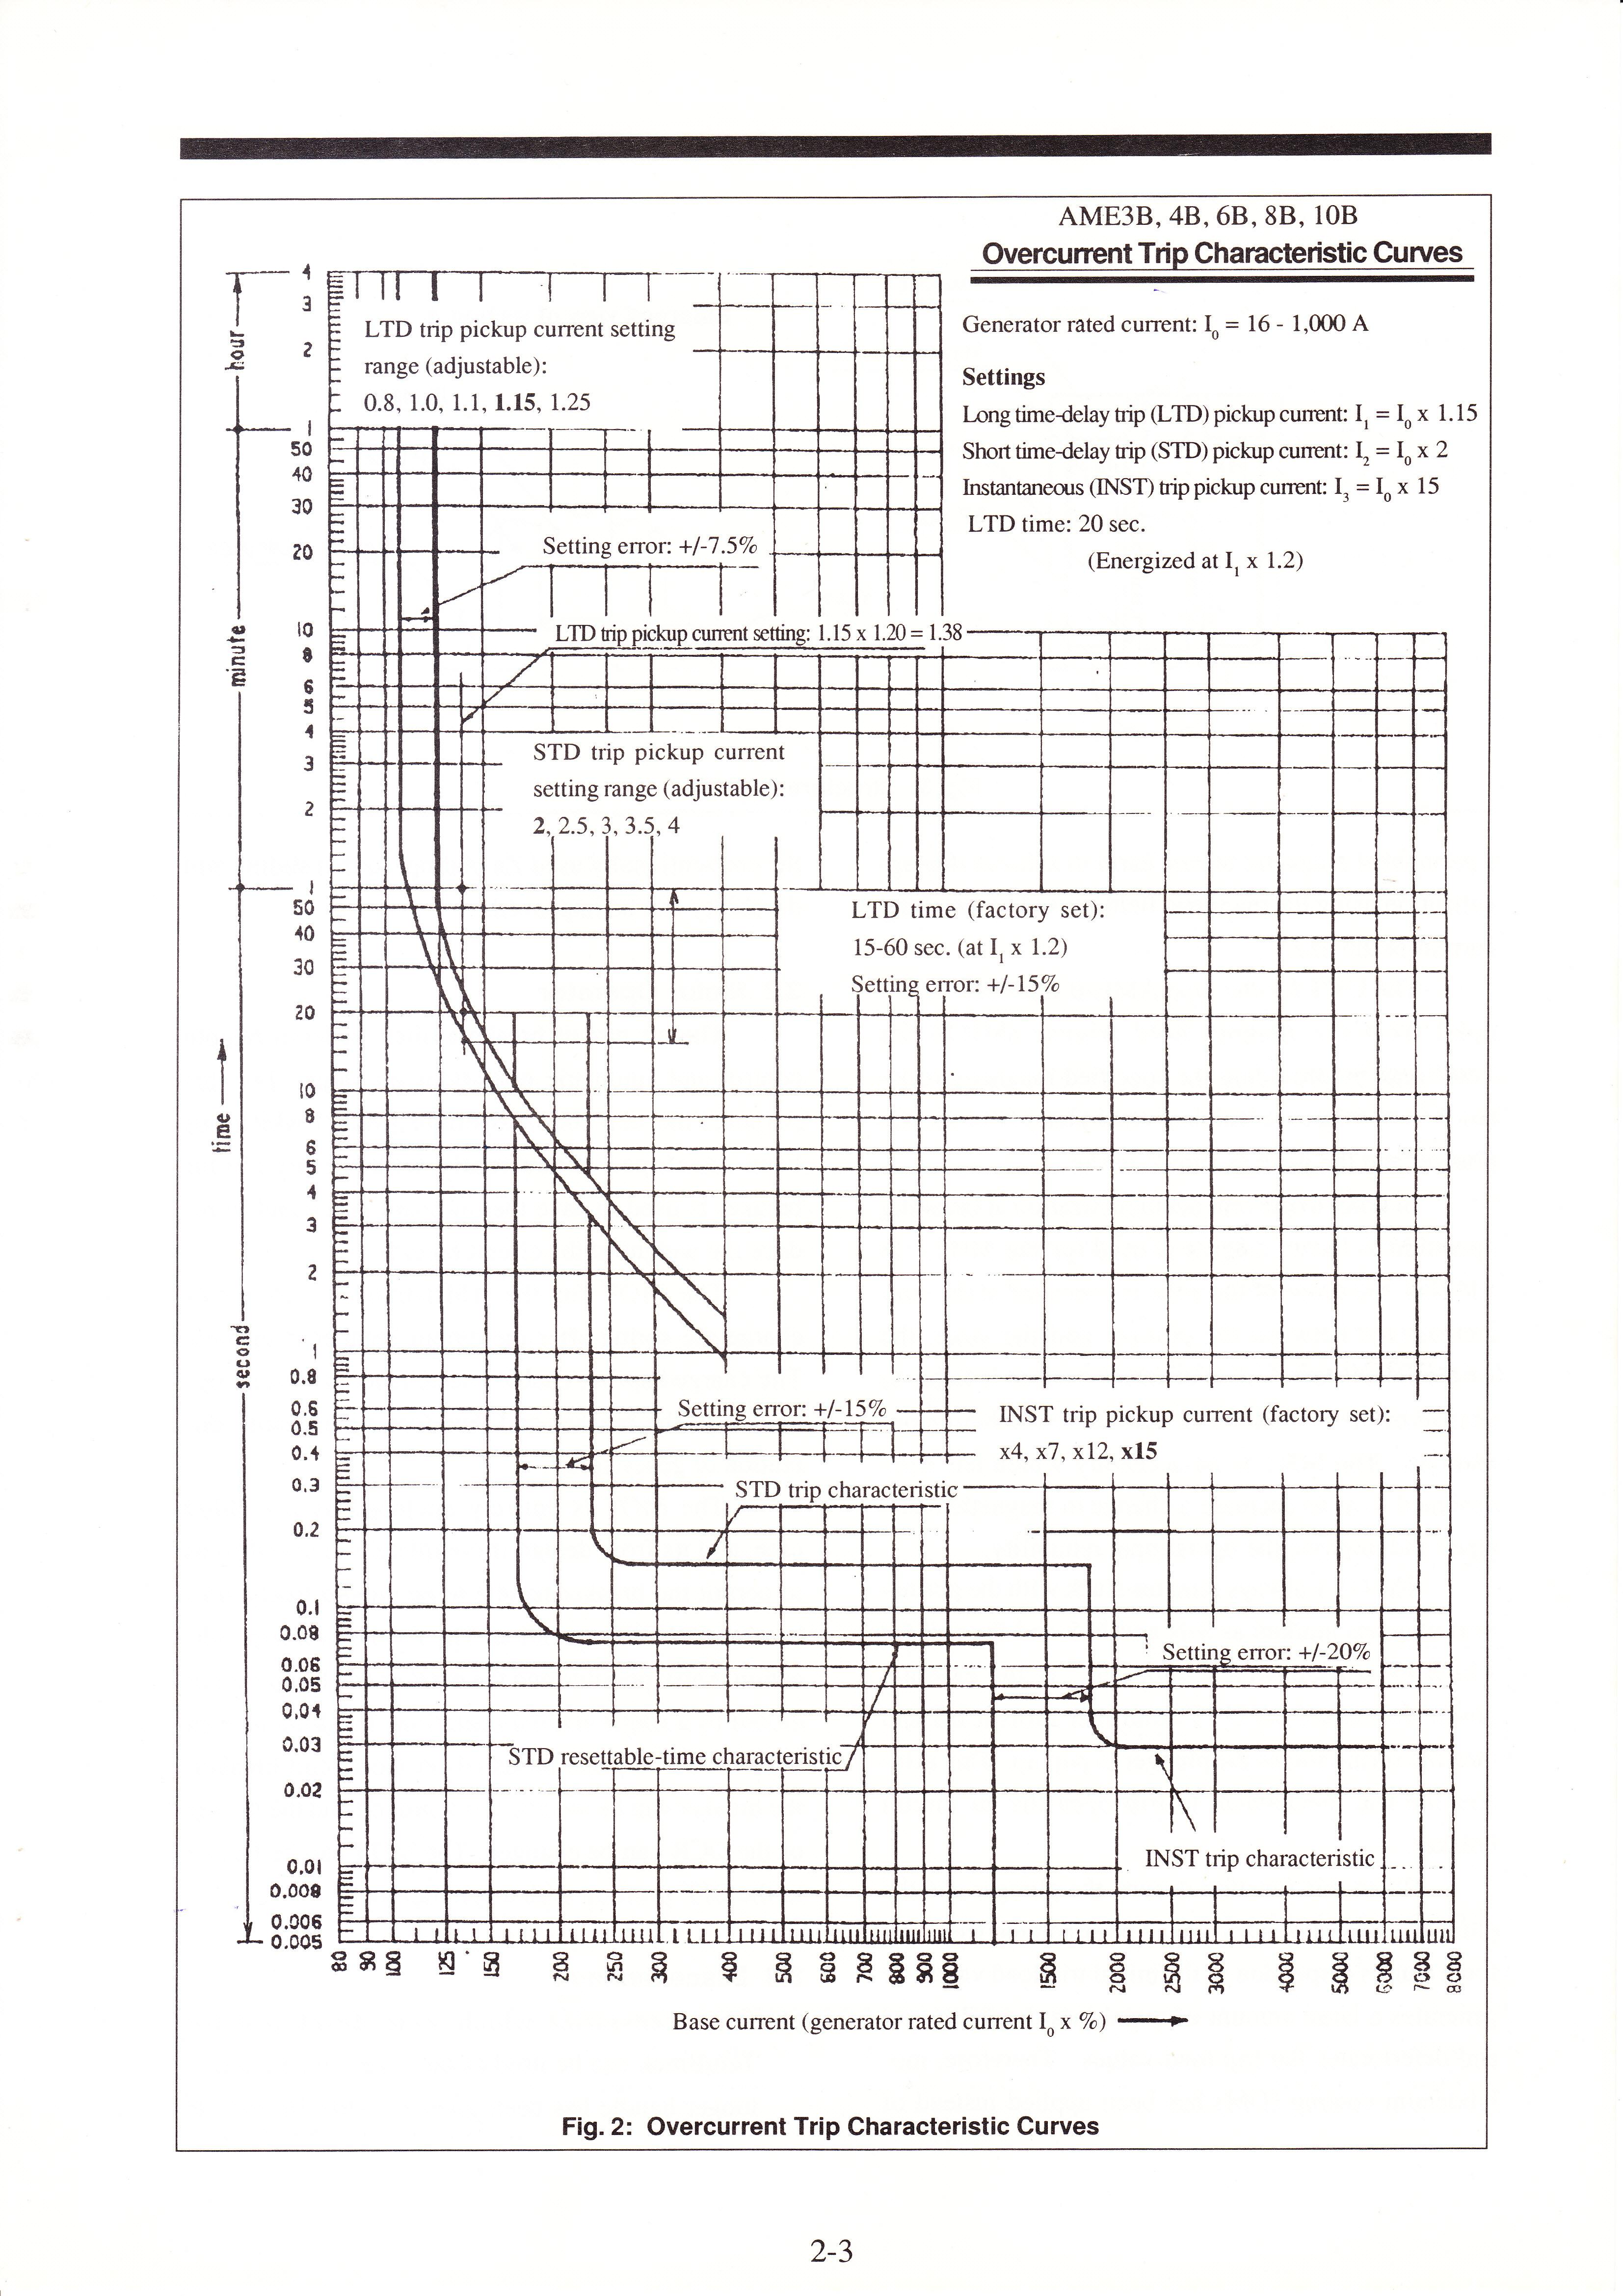 1998 Chevy Cavalier Z24 24l Ld9 Pcm Wiring Diagram 1998 Chevy